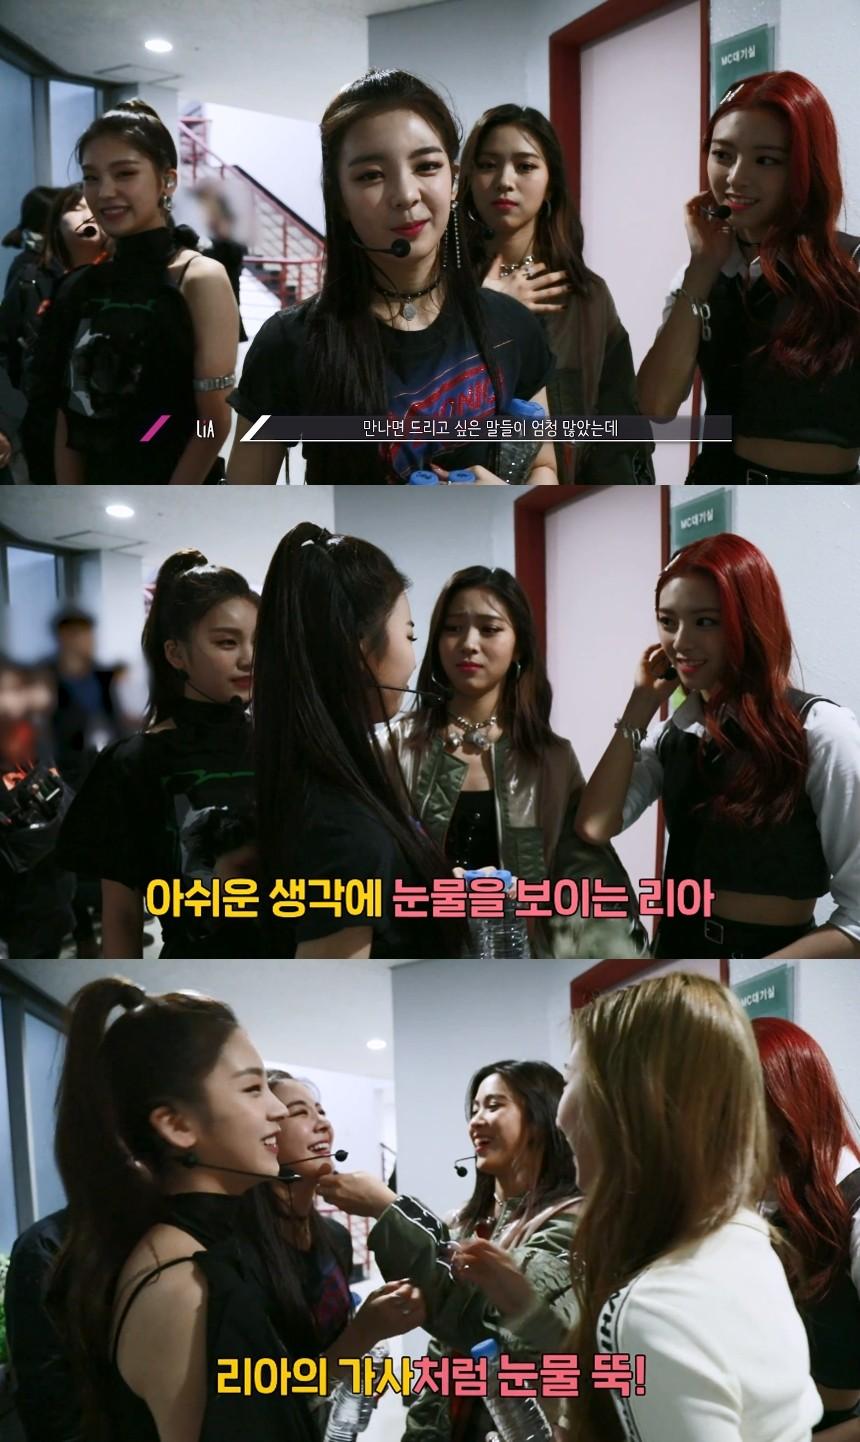 ▲ITZY是JYP最新推出的女團。(圖/翻攝自ITZY推特)